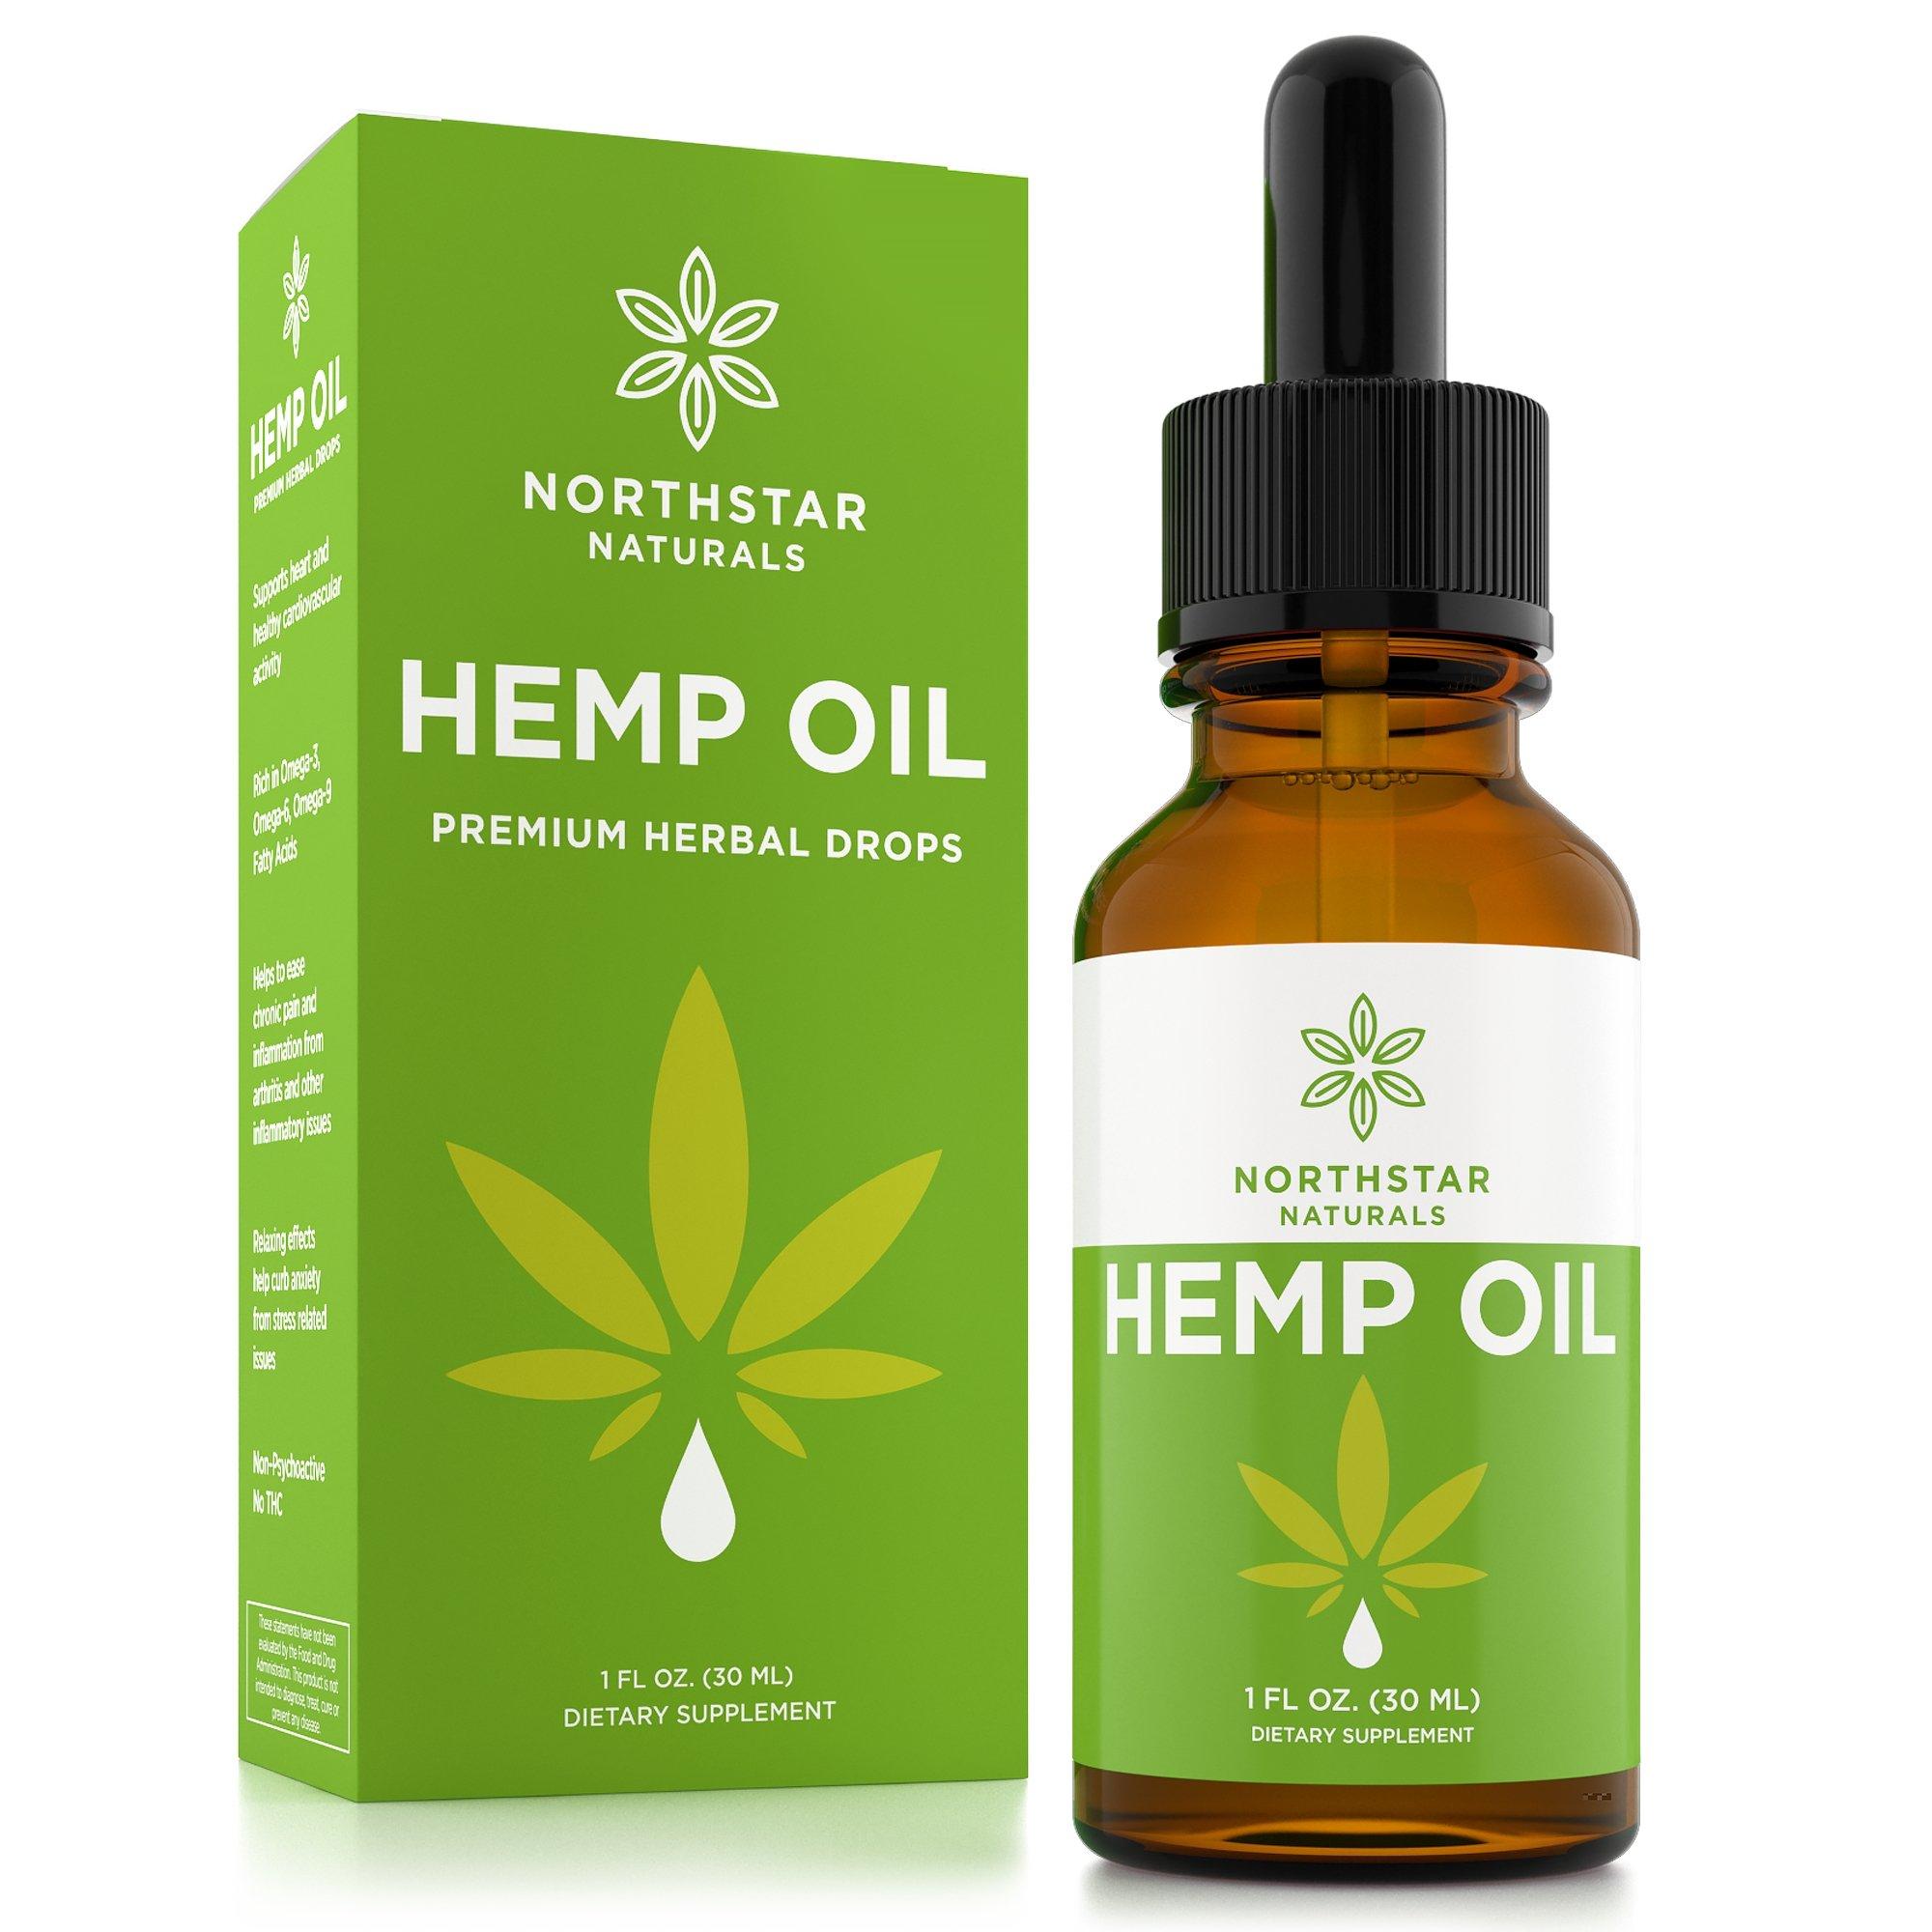 Hemp Oil for Pain & Anxiety Relief - 250mg Full Spectrum Organic Hemp Drops - Natural Hemp Oils for Better Sleep, Mood & Stress - Pure Hemp Extract - Zero THC CBD Cannabidiol - Mint Flavor